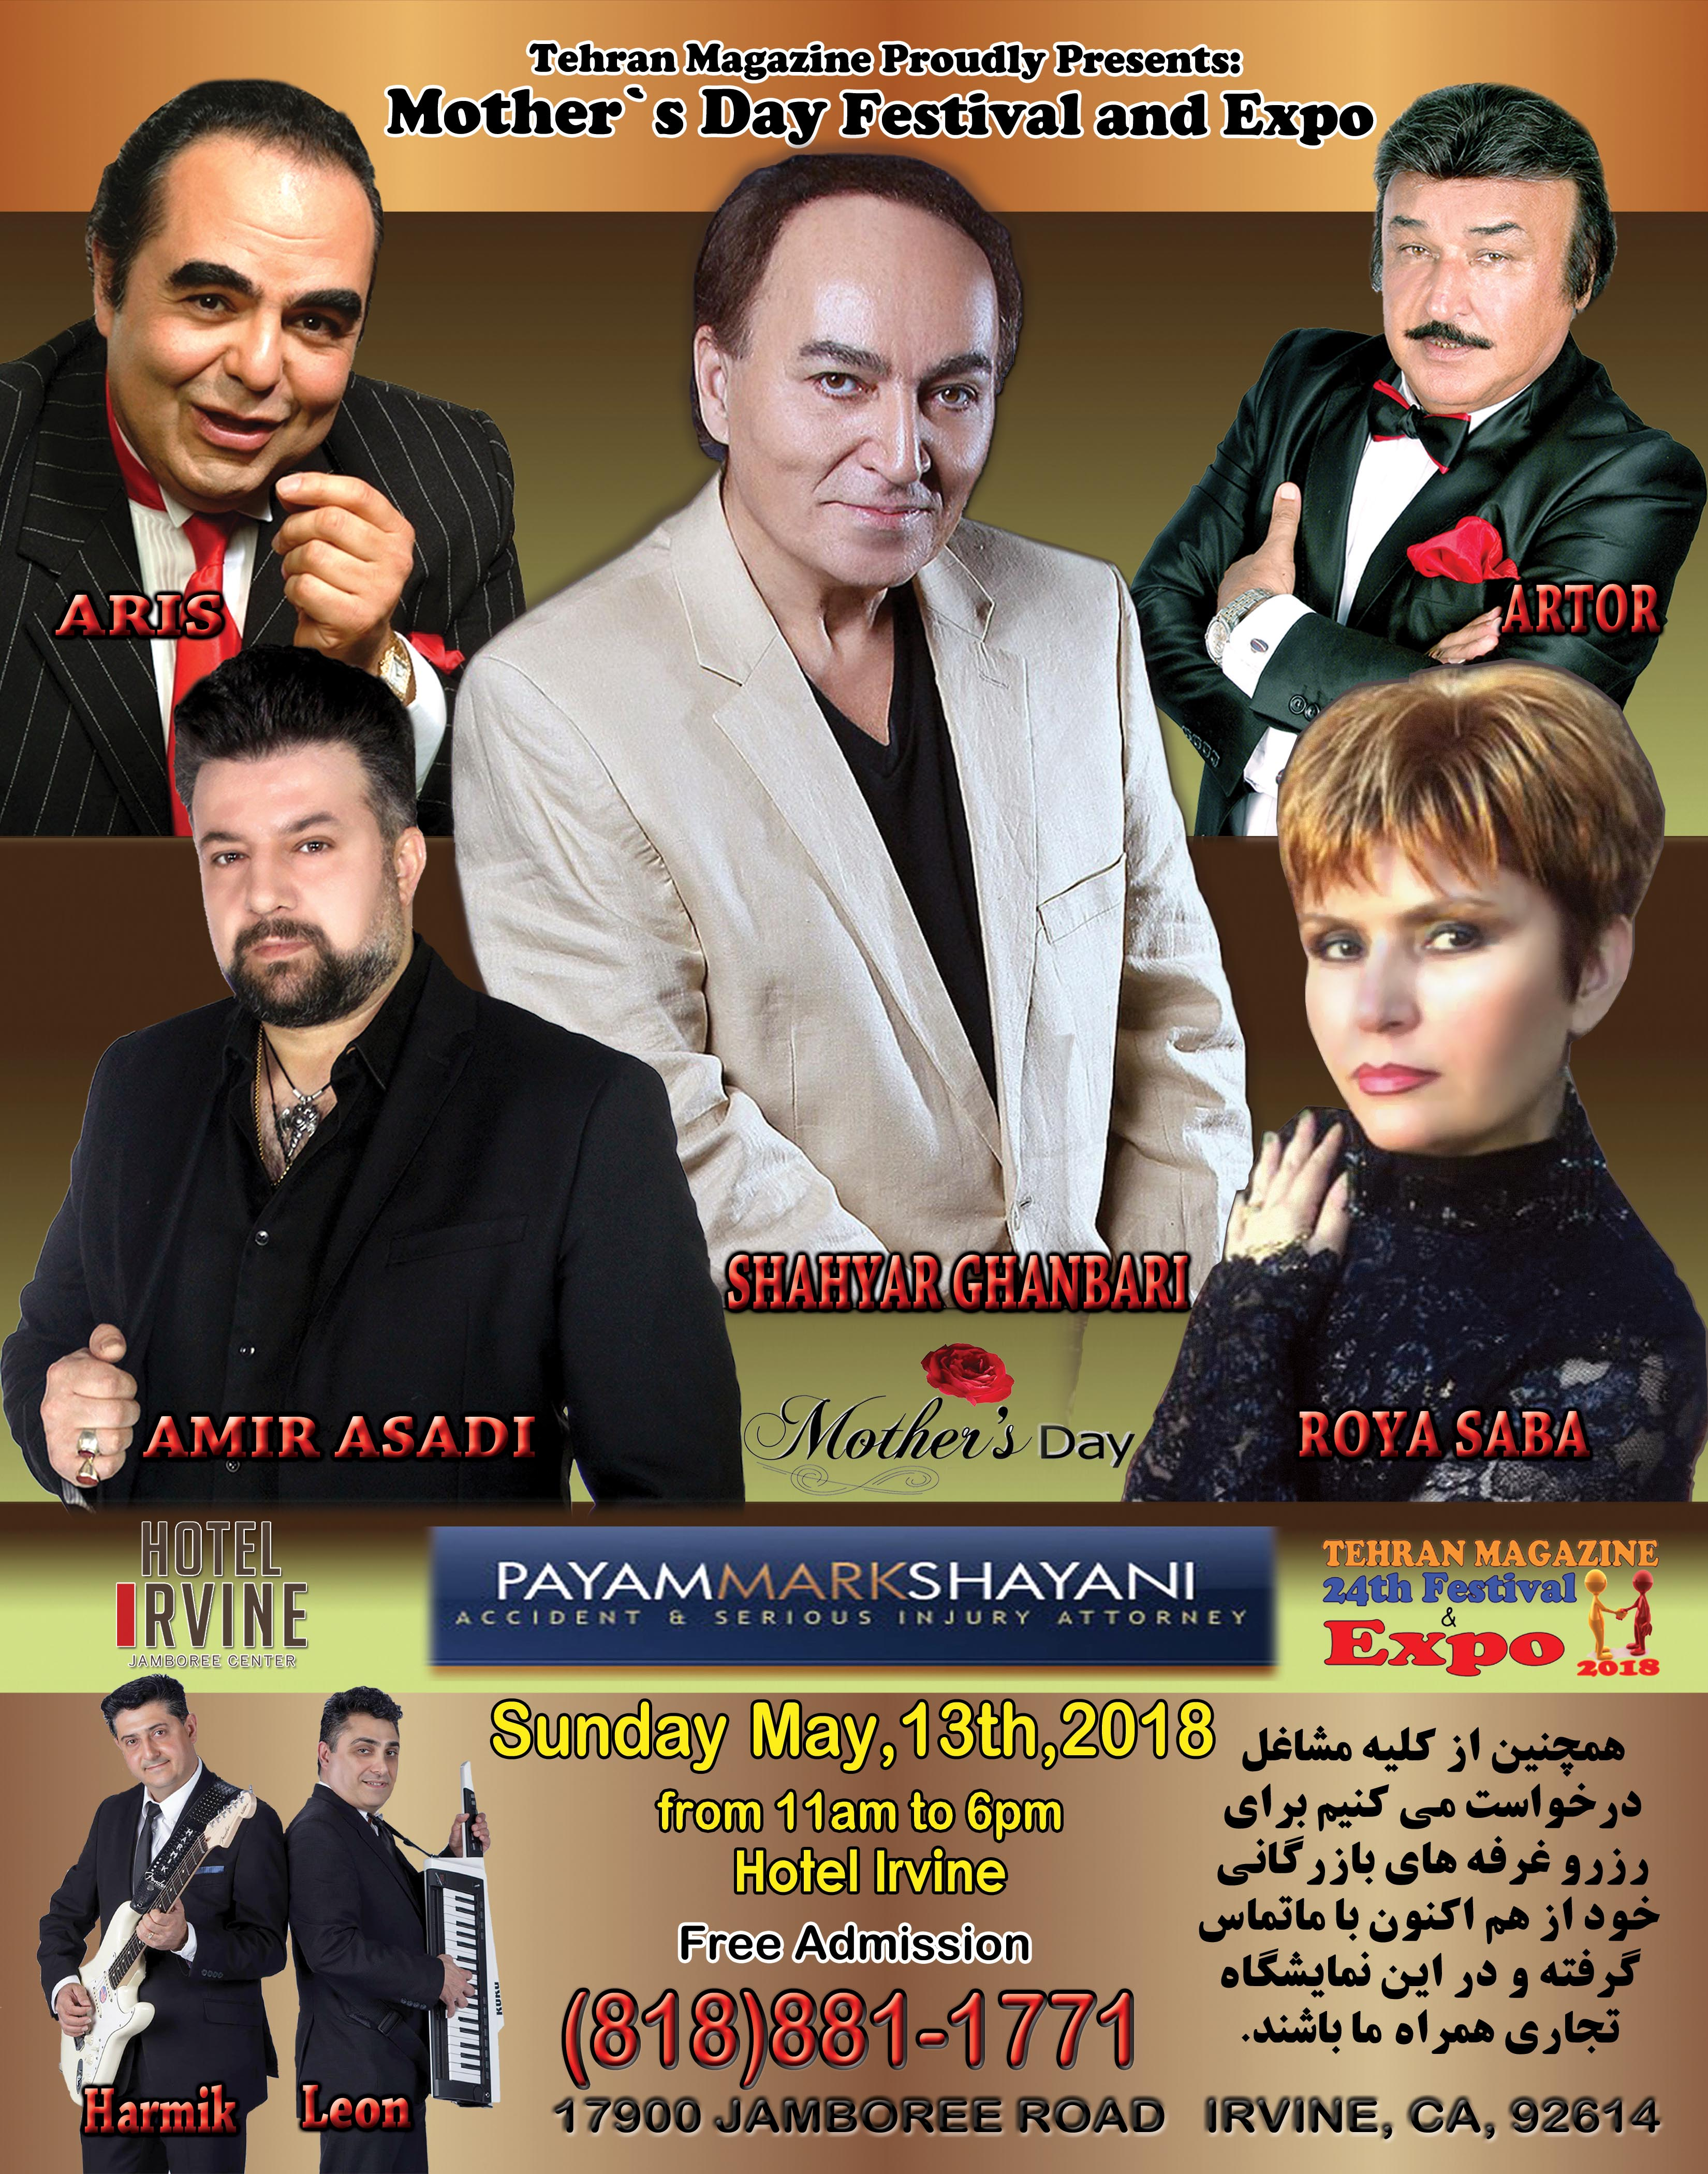 shahbod noori-tehran-magazine